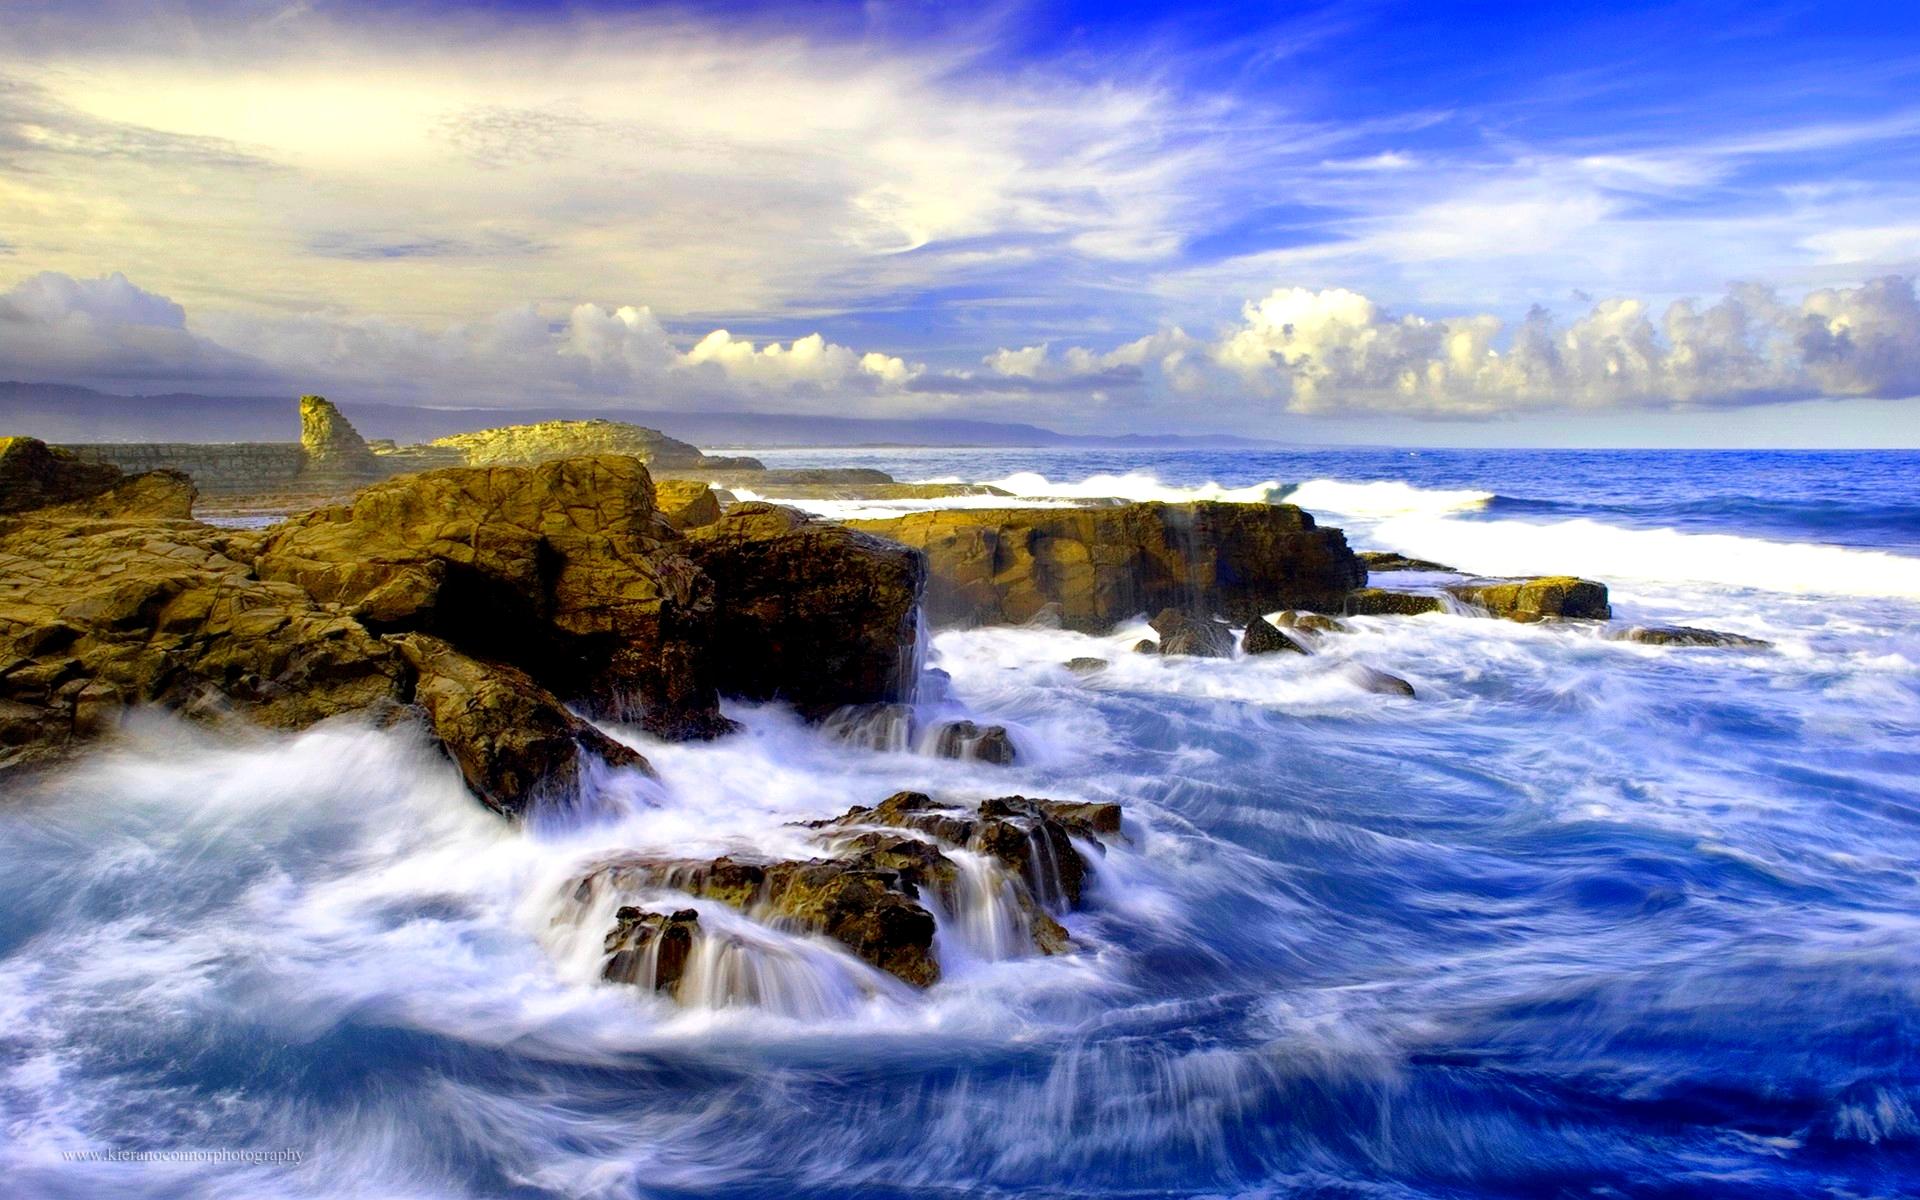 crashing waves wallpaper beach